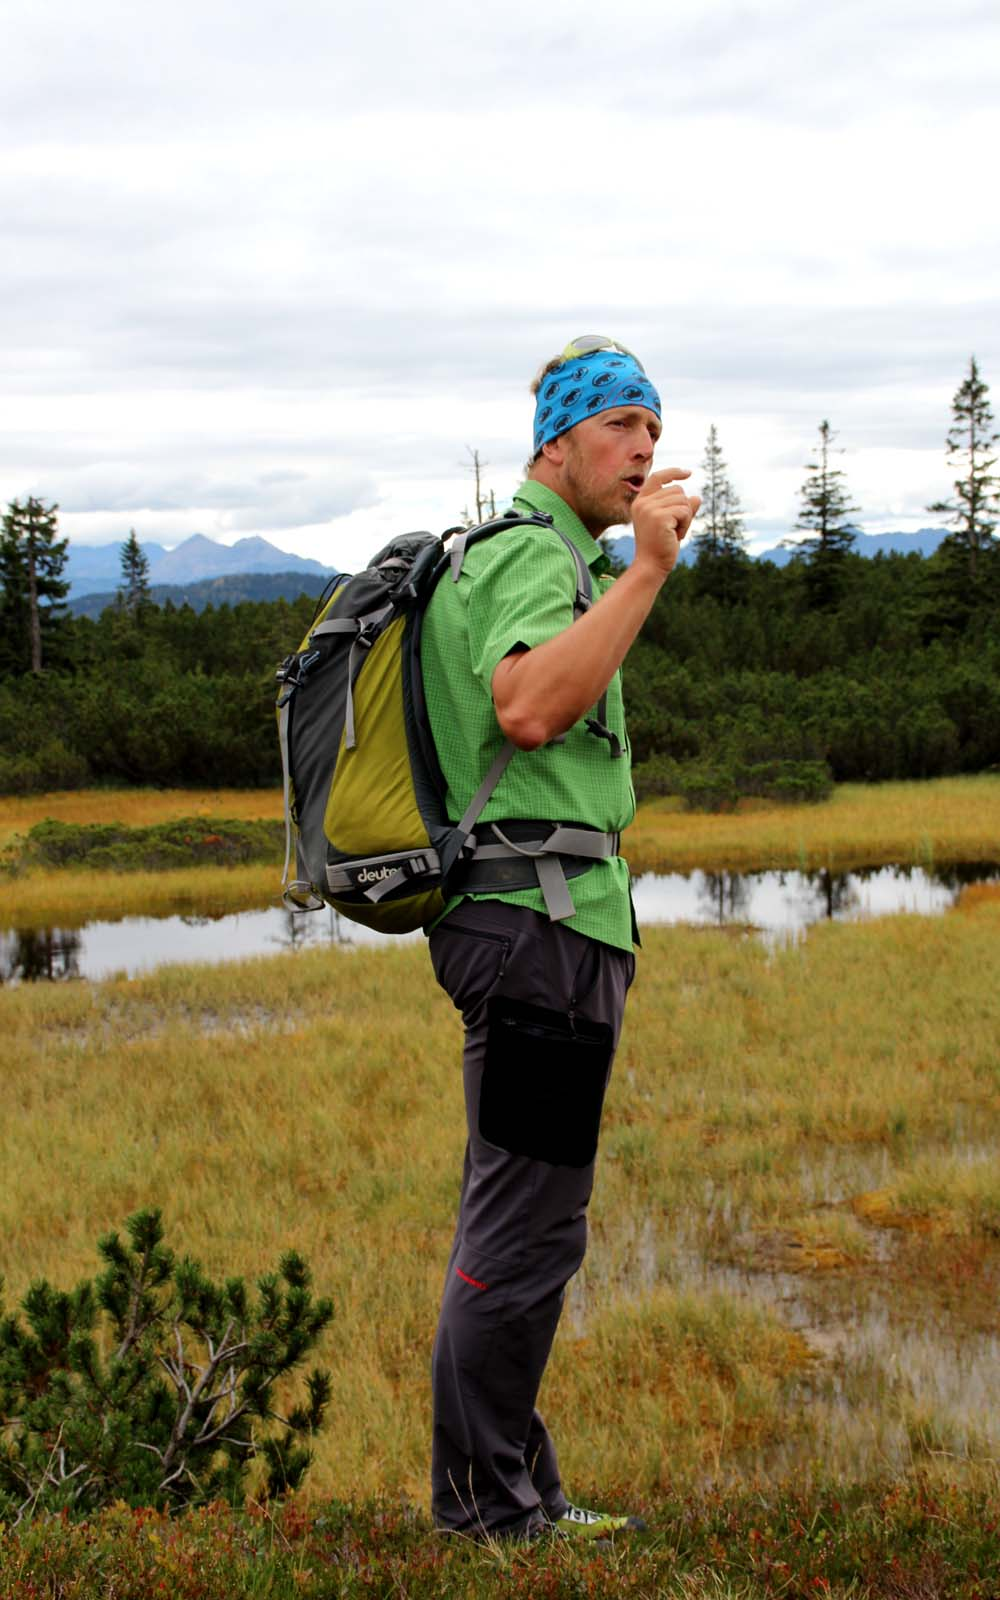 Wanderführer Coen Weesjes erklärt sensible Ökosystem